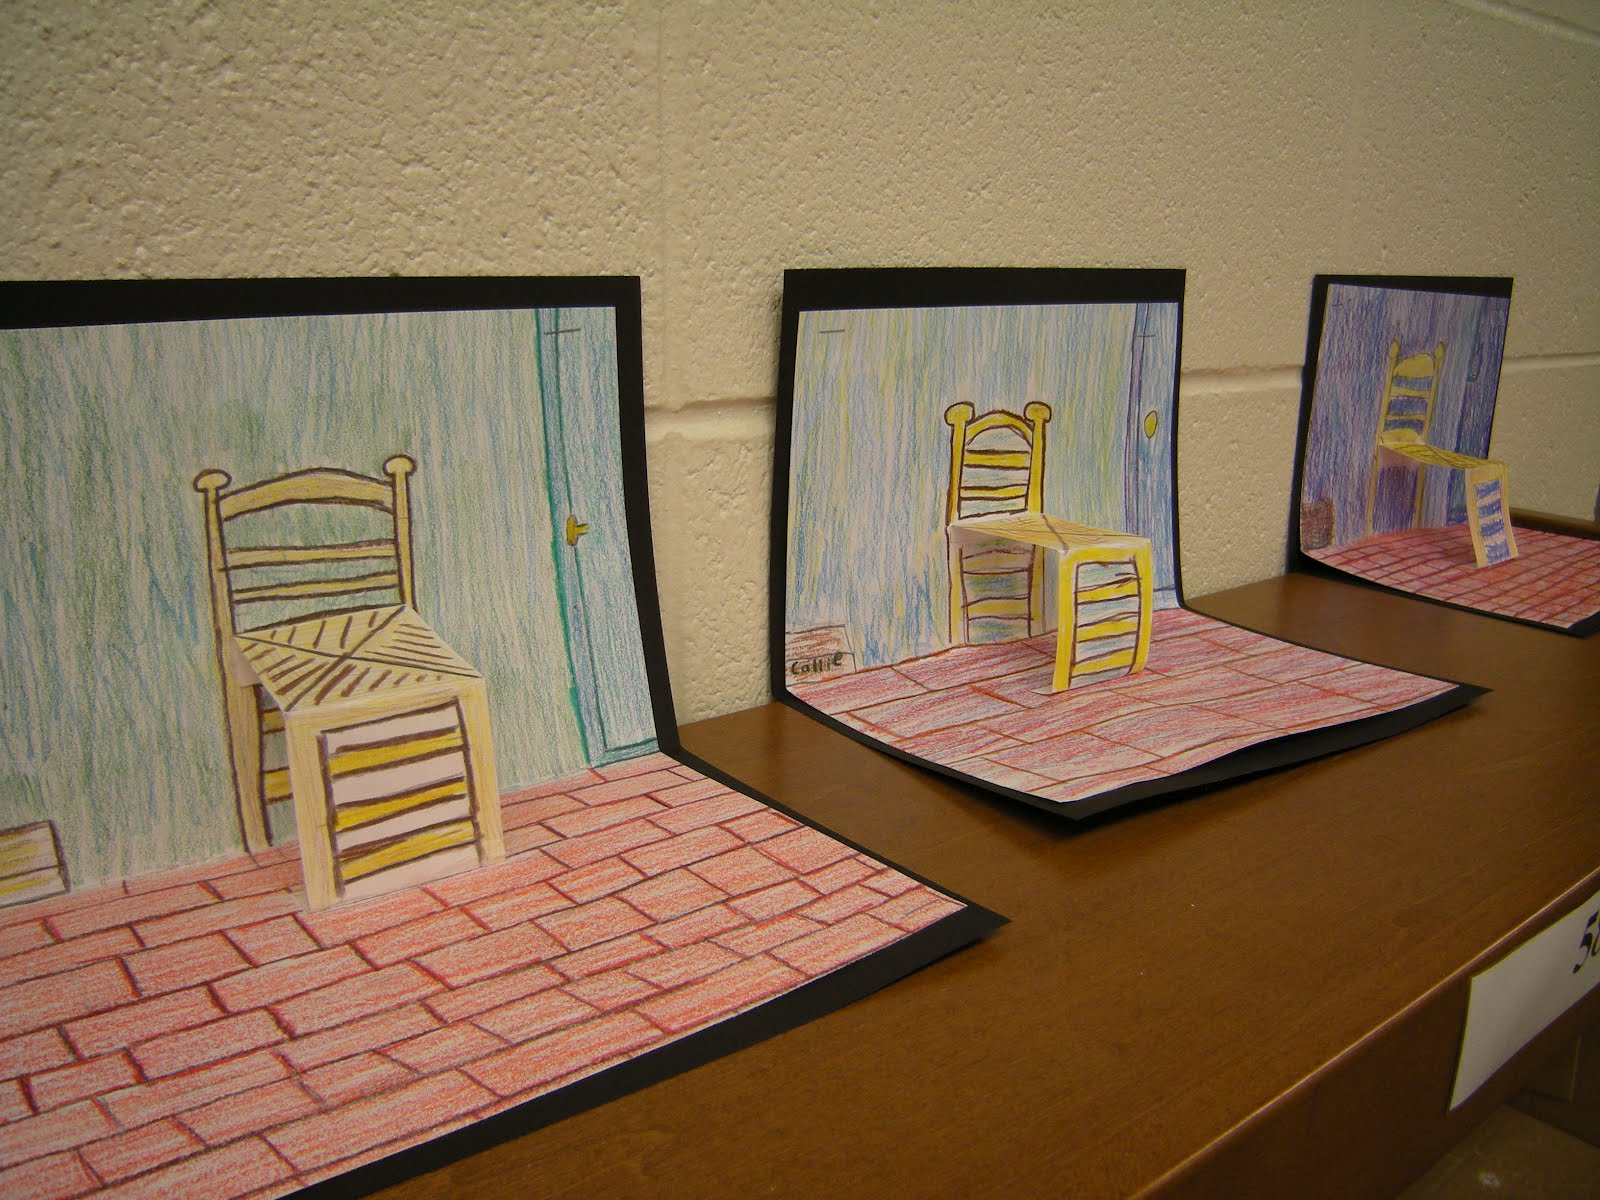 Artolazzi Van Gogh Pop Up Chairs